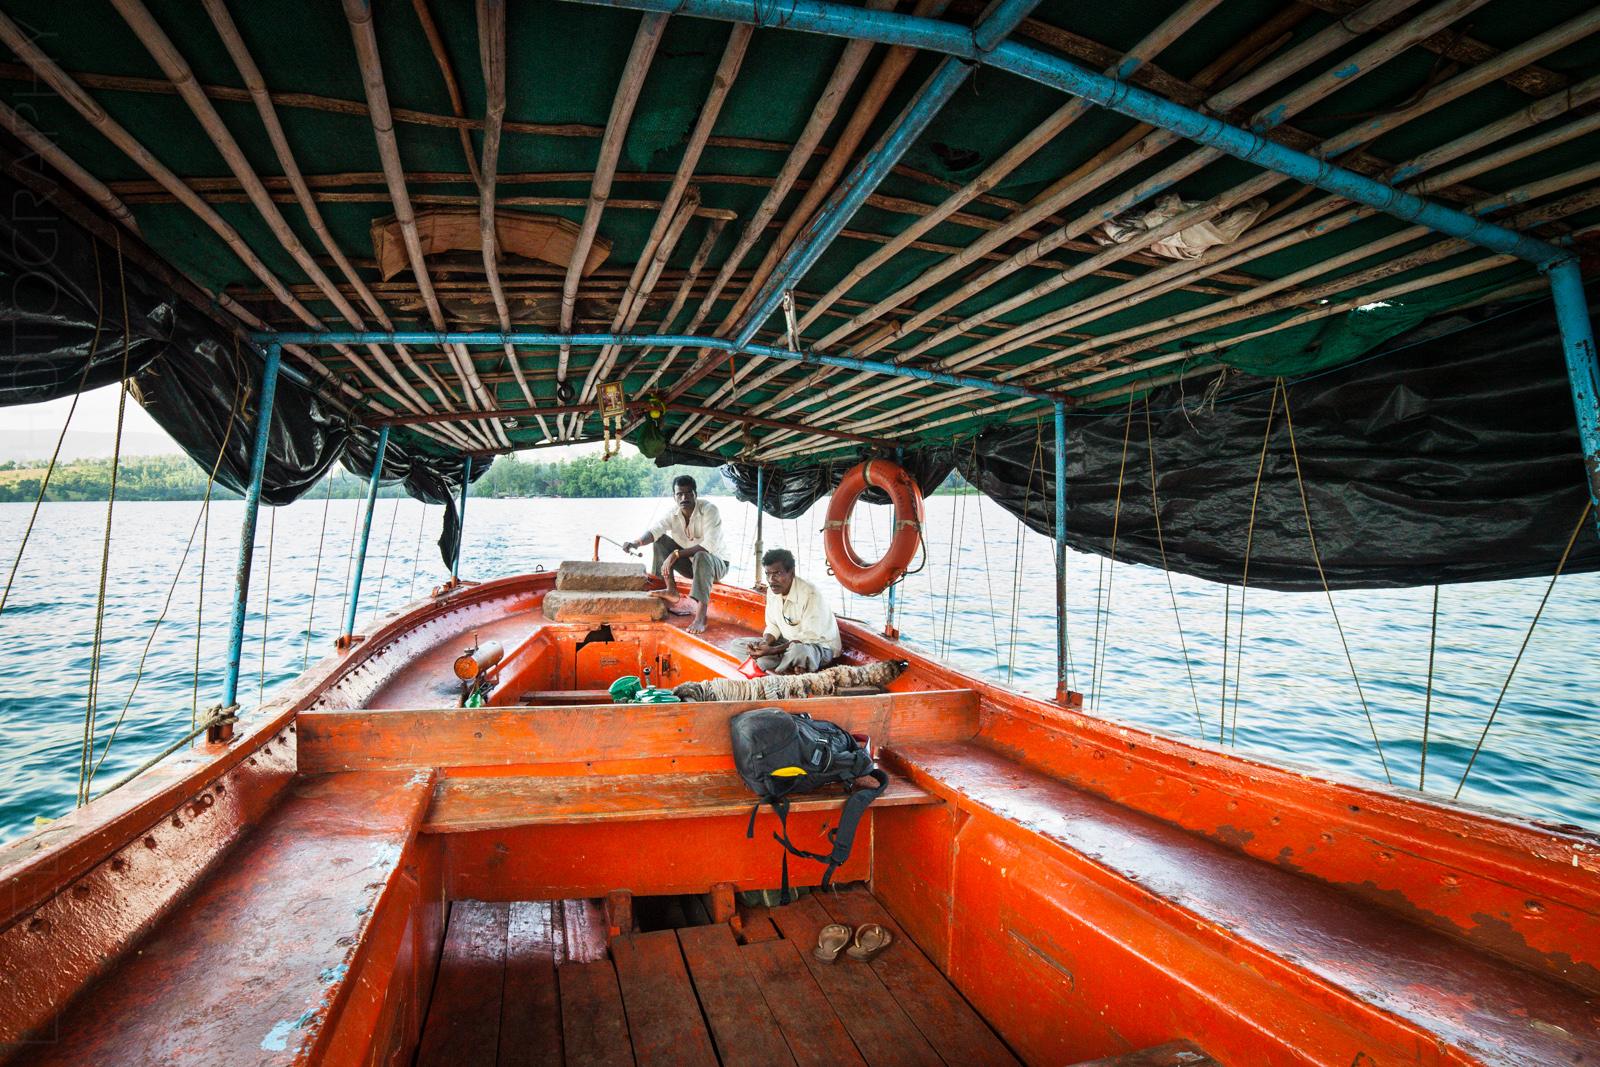 Boat ride at Bamnoli